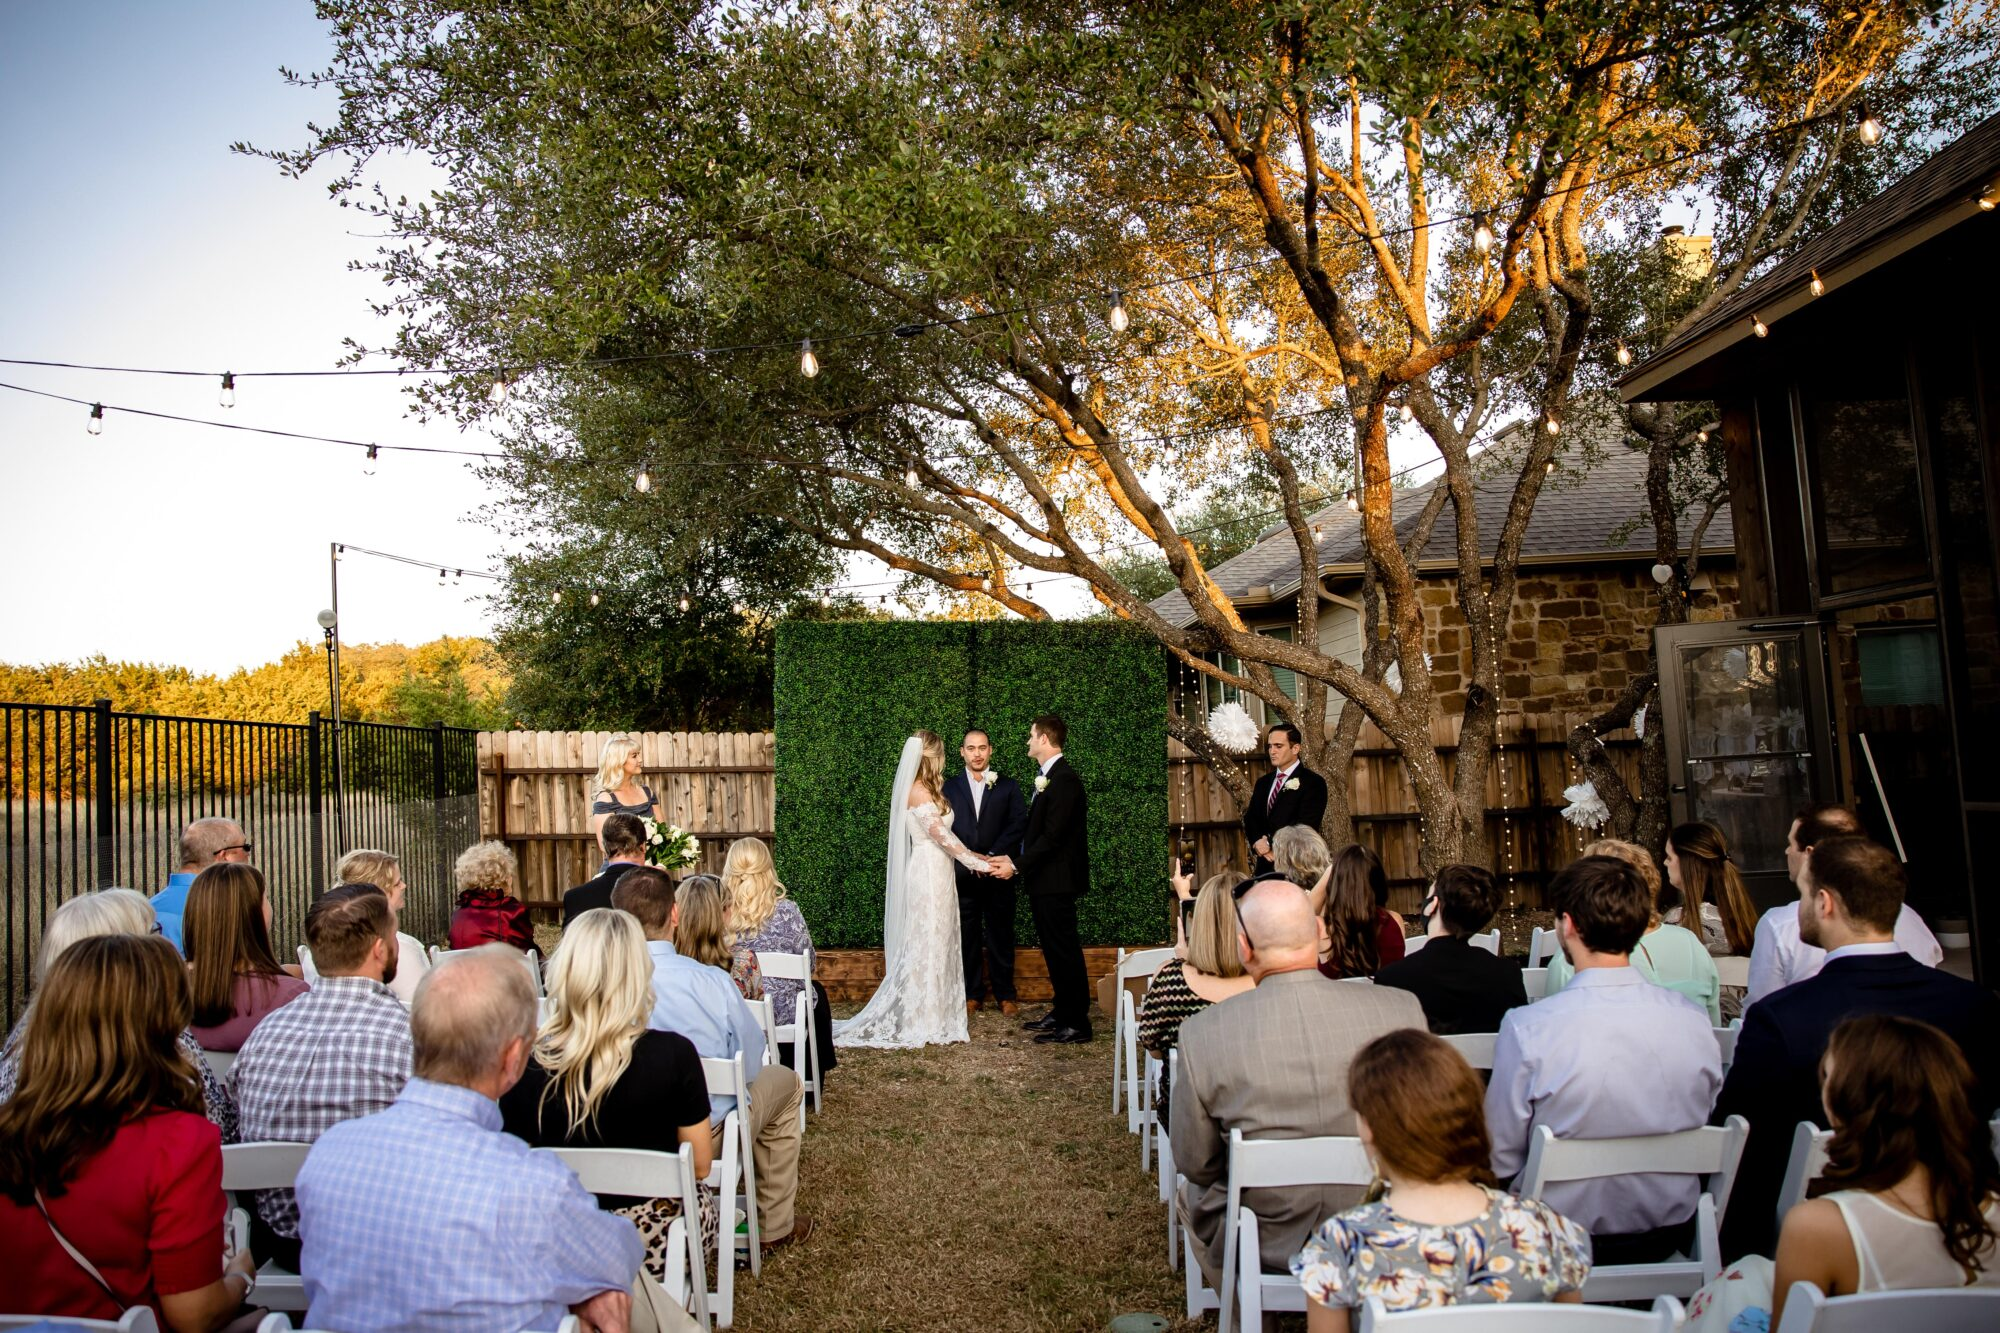 Budget-friendly backyard wedding